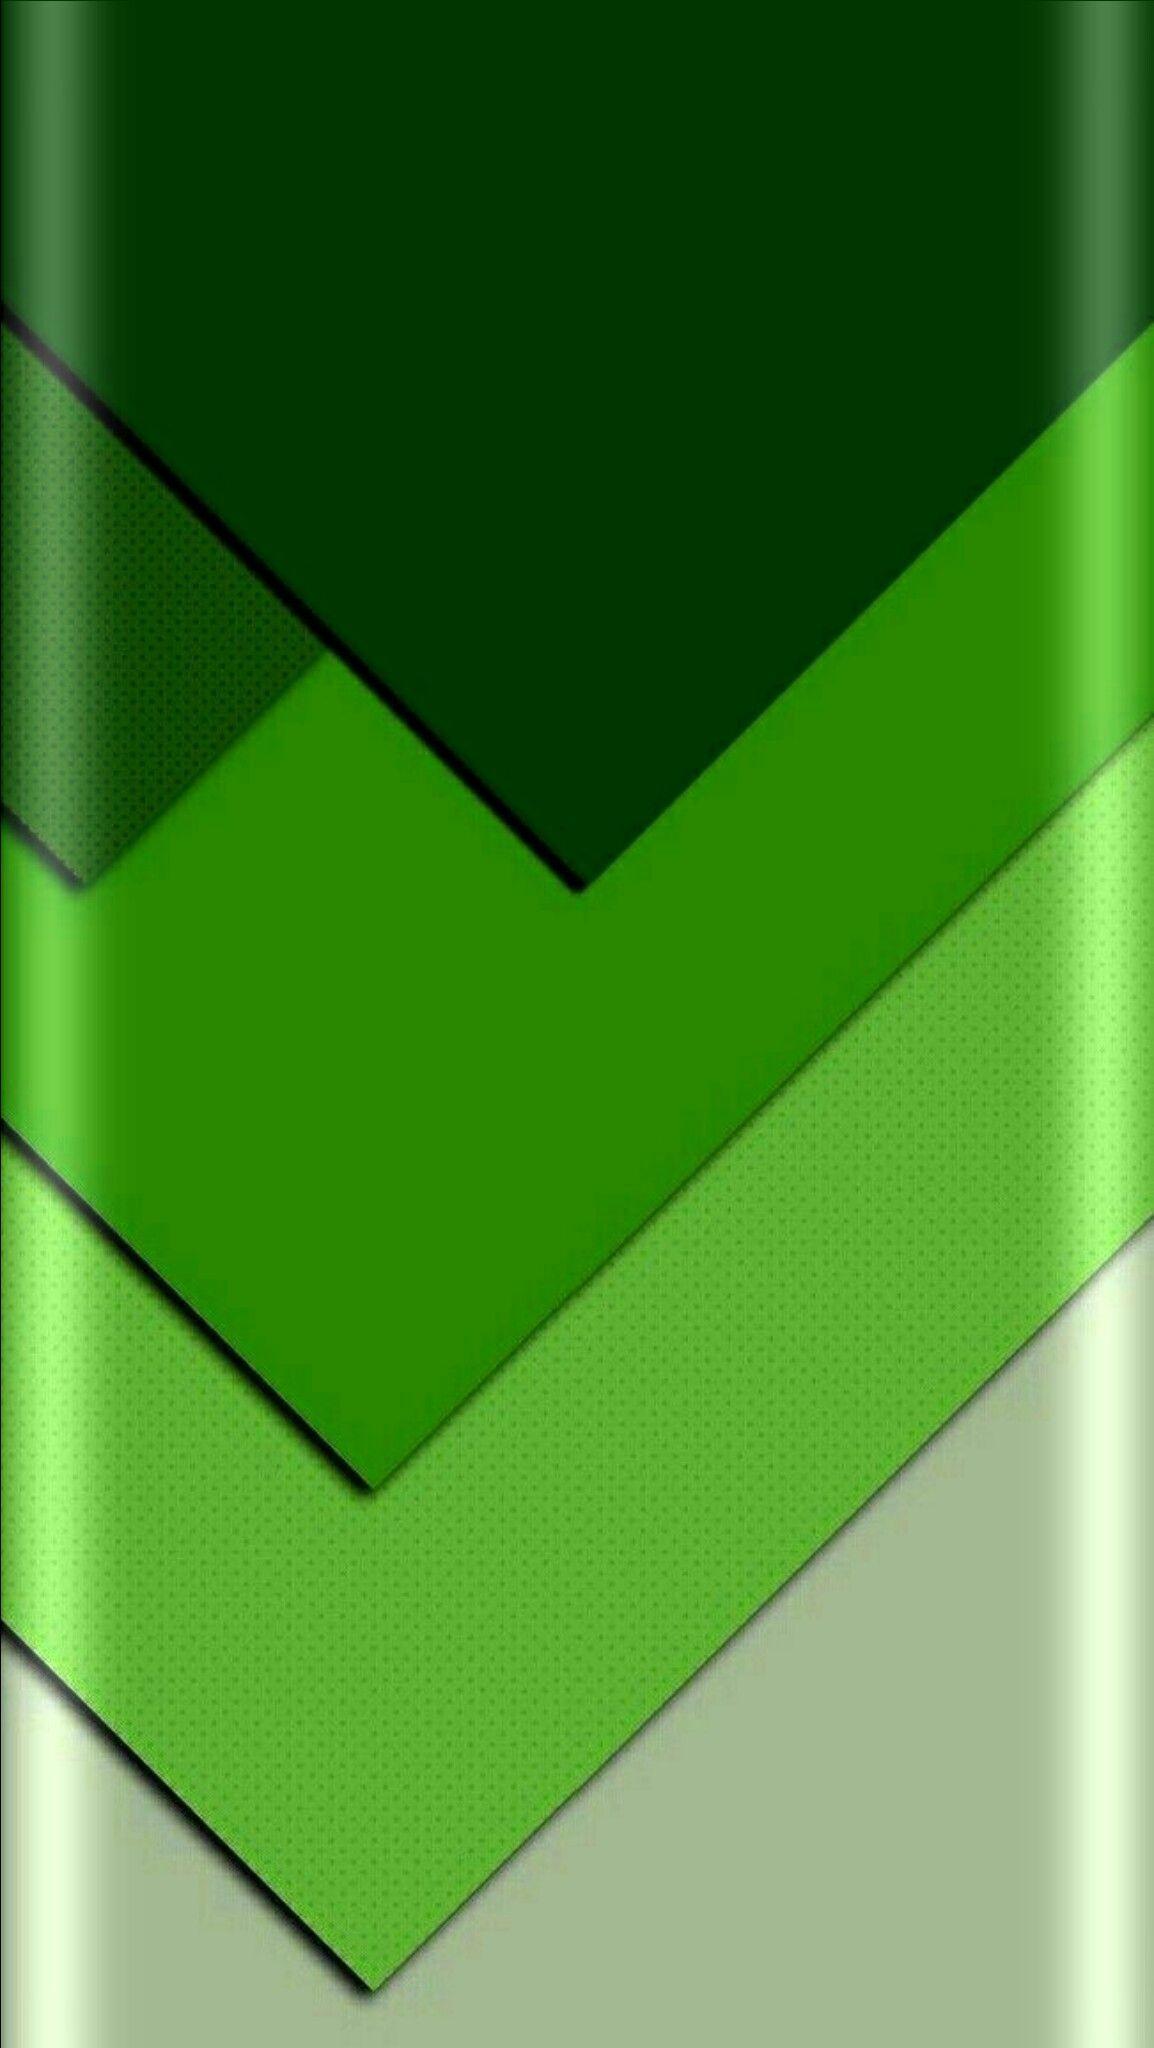 Green Abstract Wallpaper Android Wallpaper Abstract Wallpaper